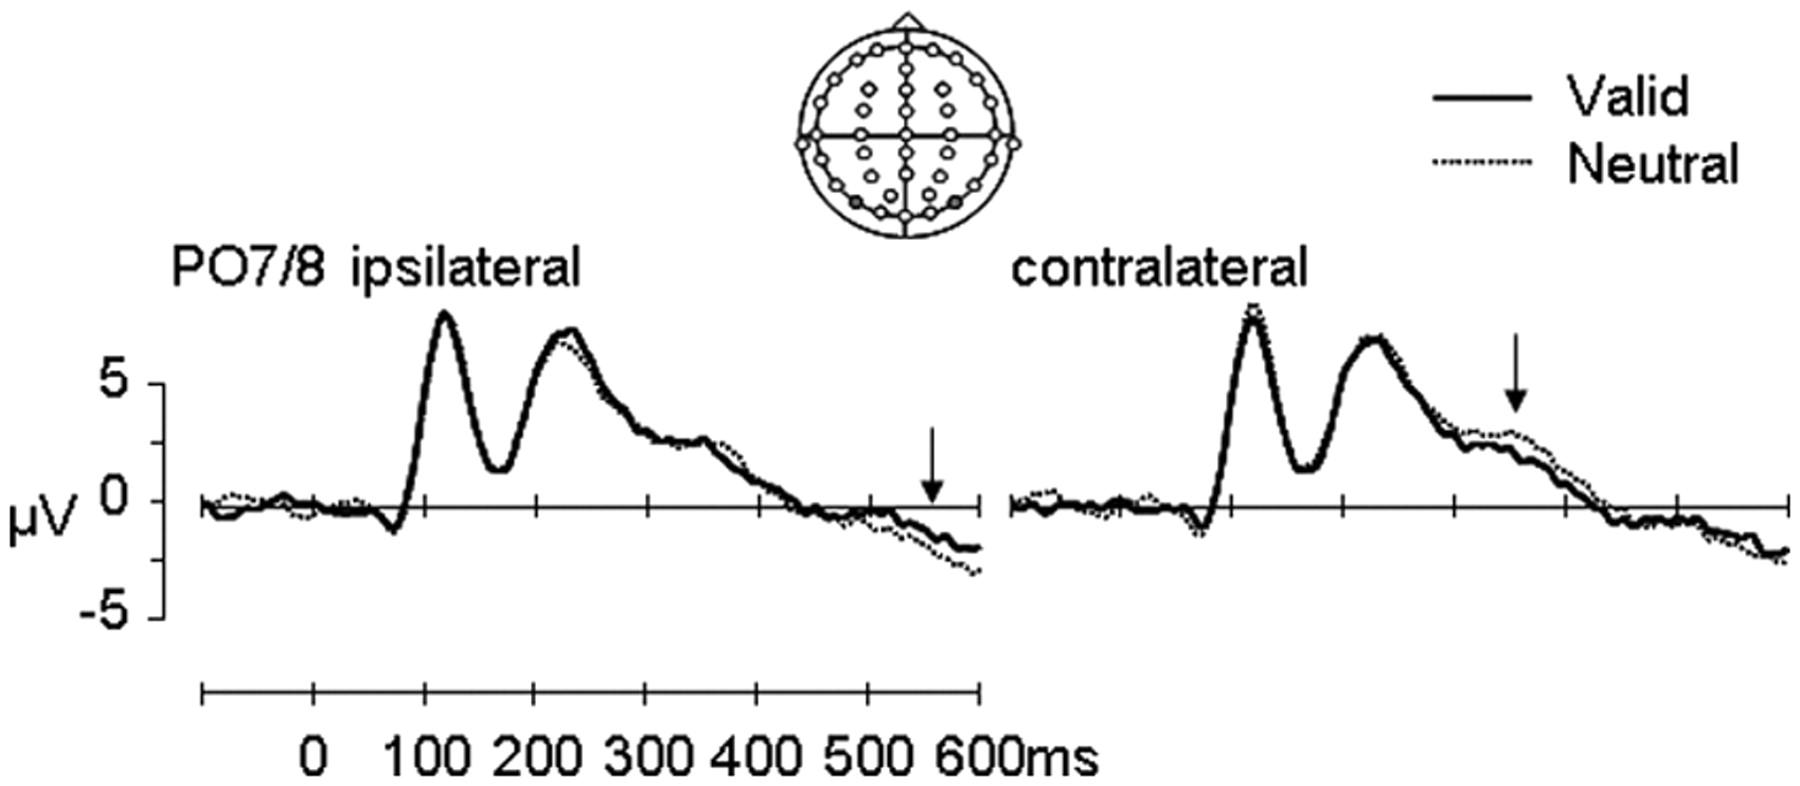 Biasing Perception by Spatial Long-Term Memory | Journal of ...